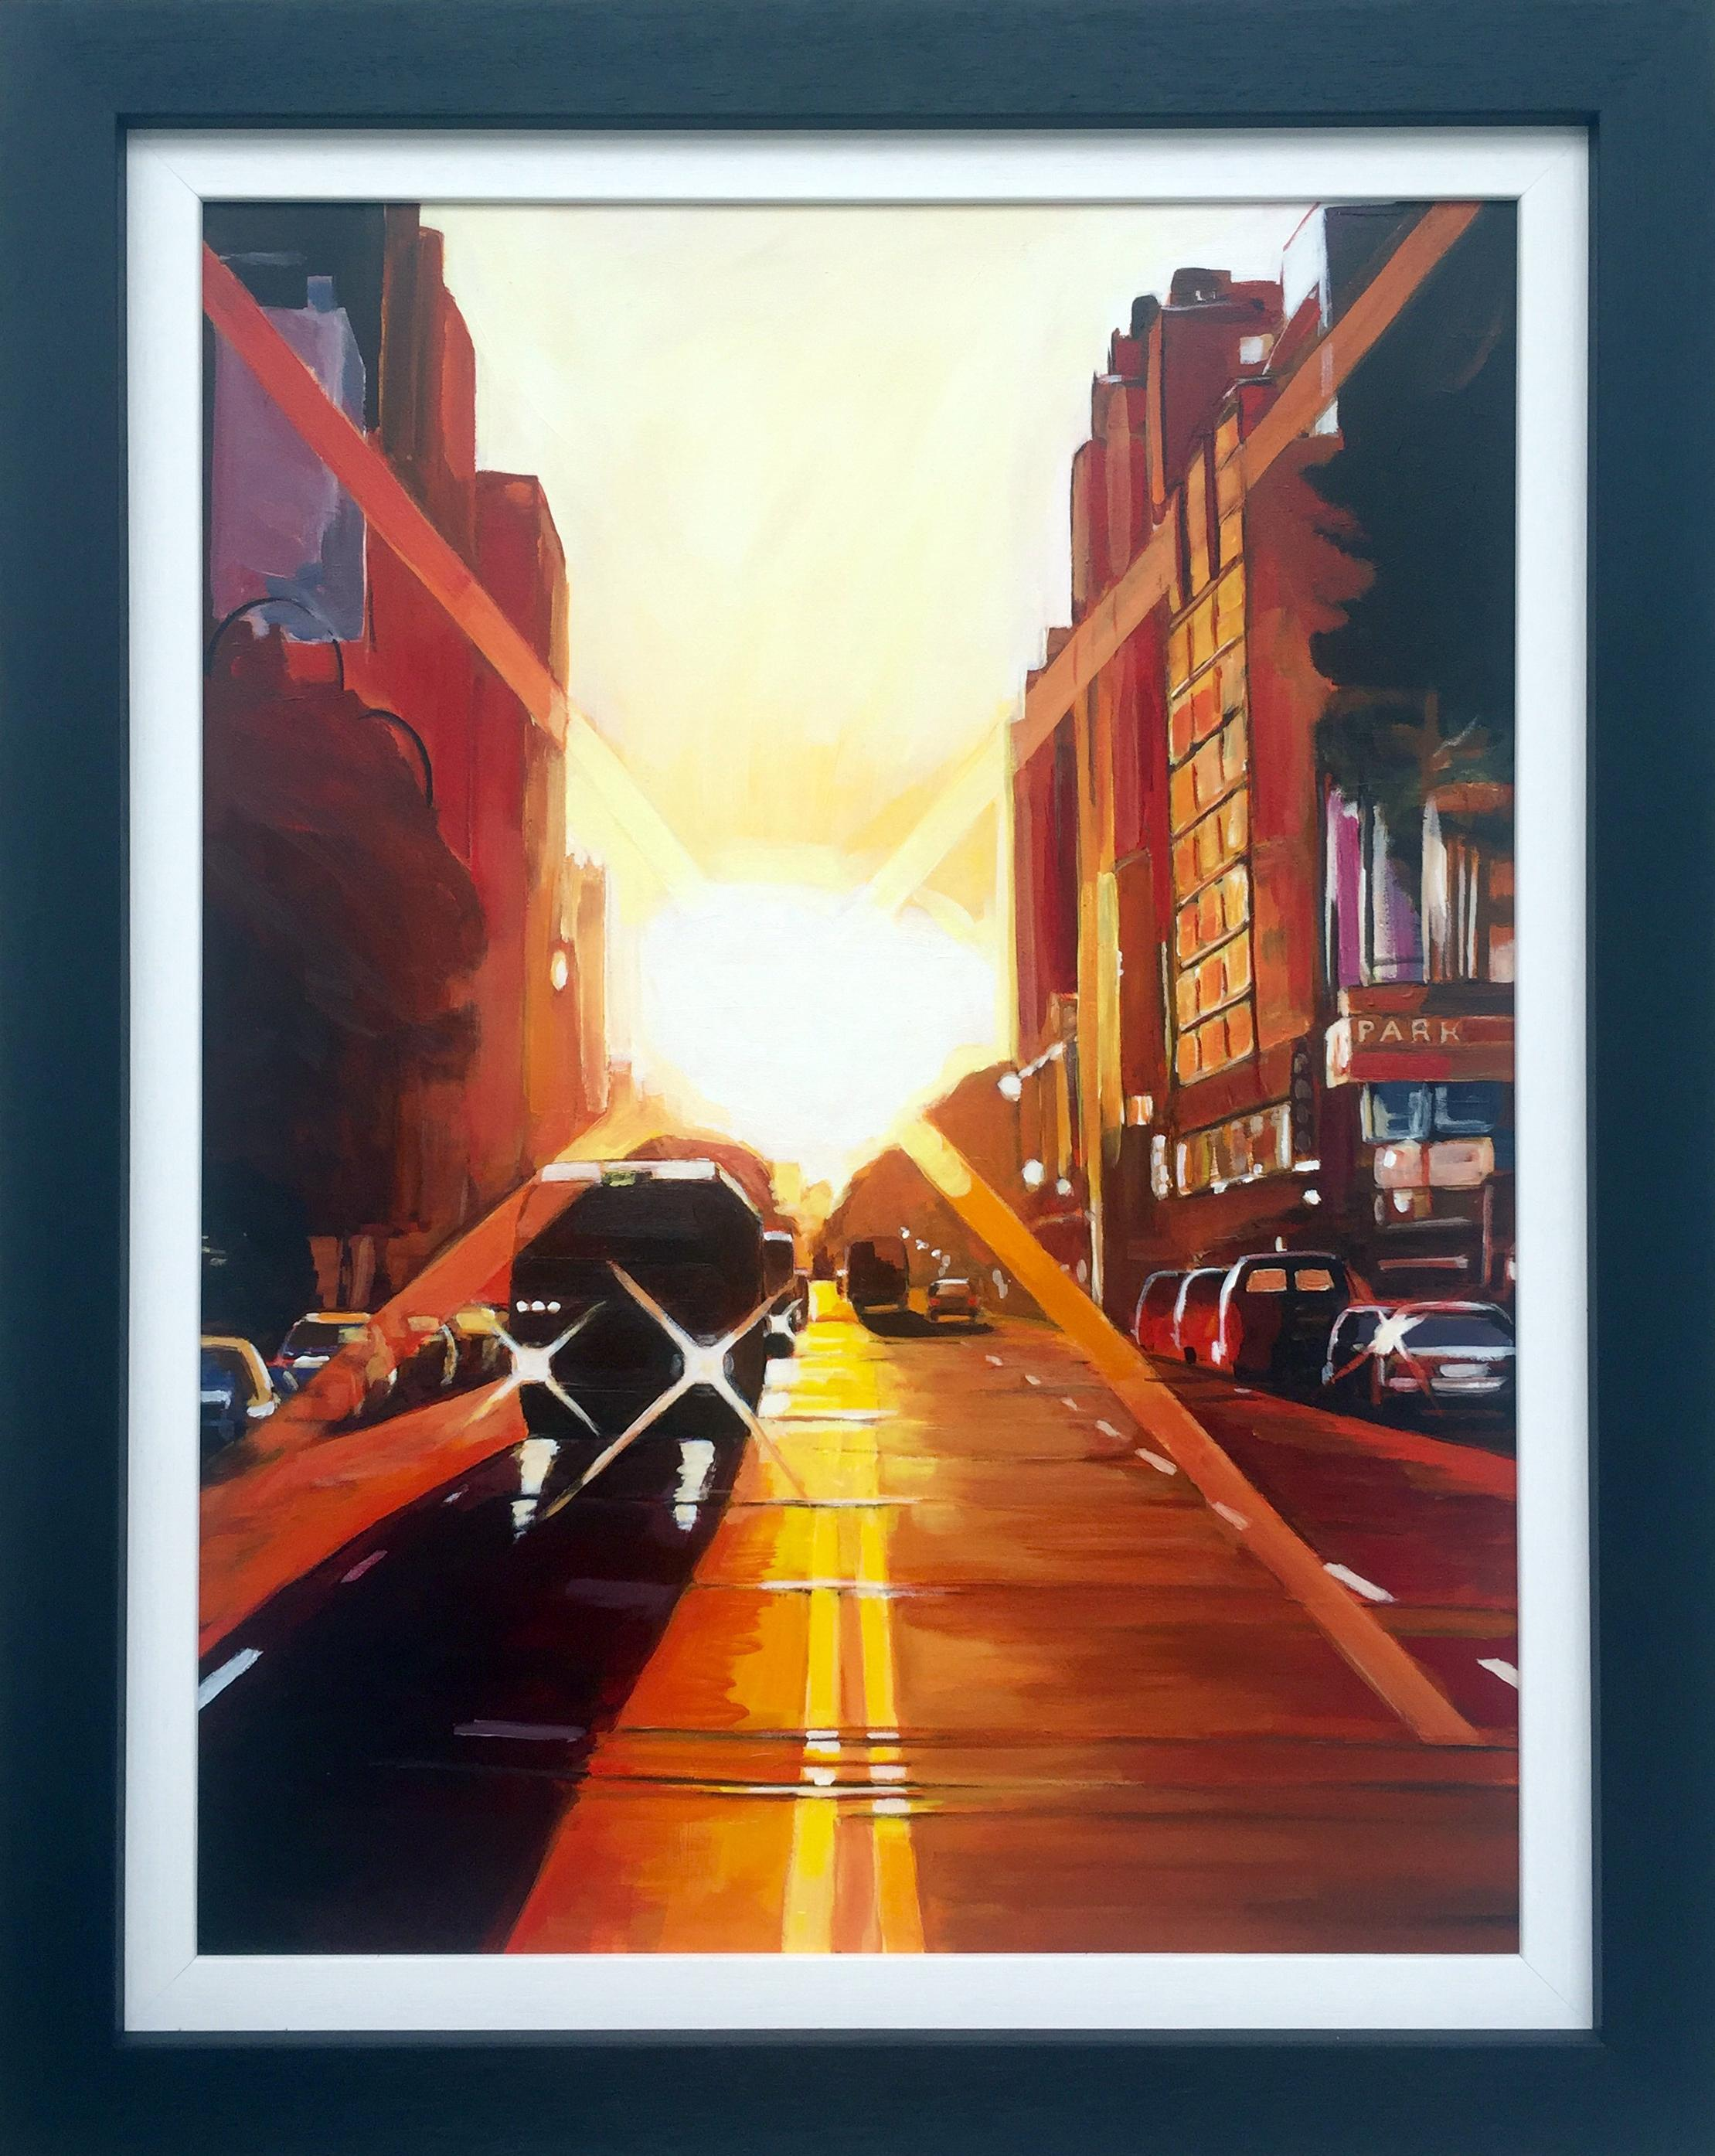 Manhattan Sunset New York City NYC Street Painting by English Landscape Artist